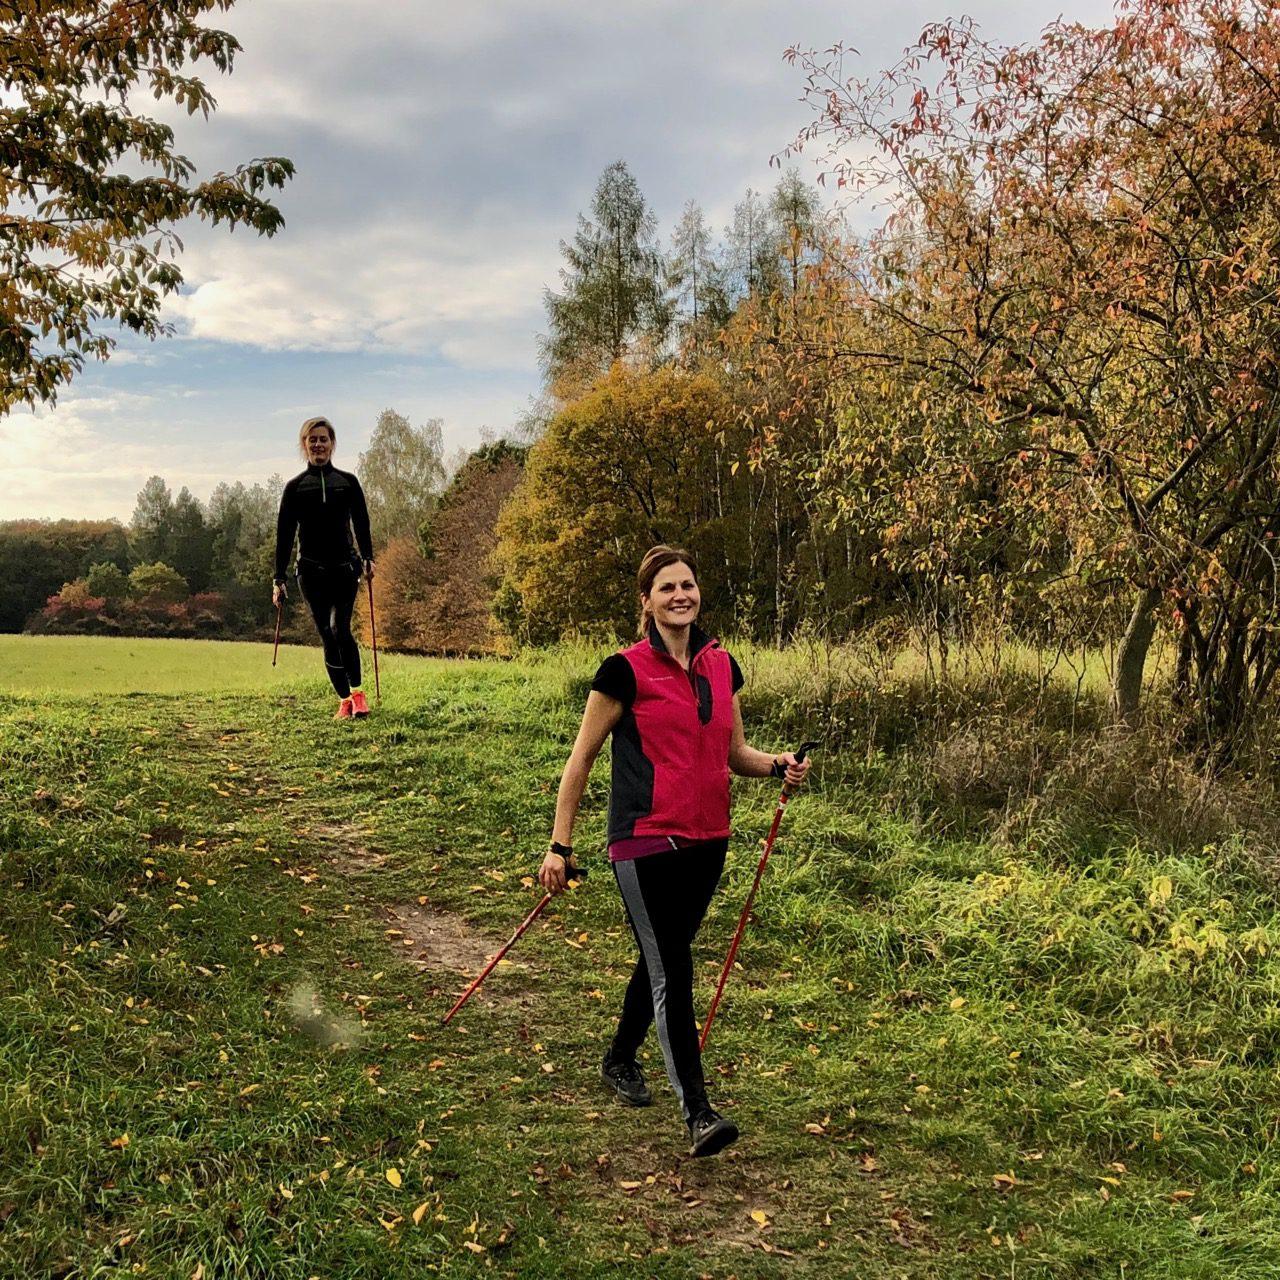 Medailonek základním kurzem nordic walking s Nordic sports, podzim 2019